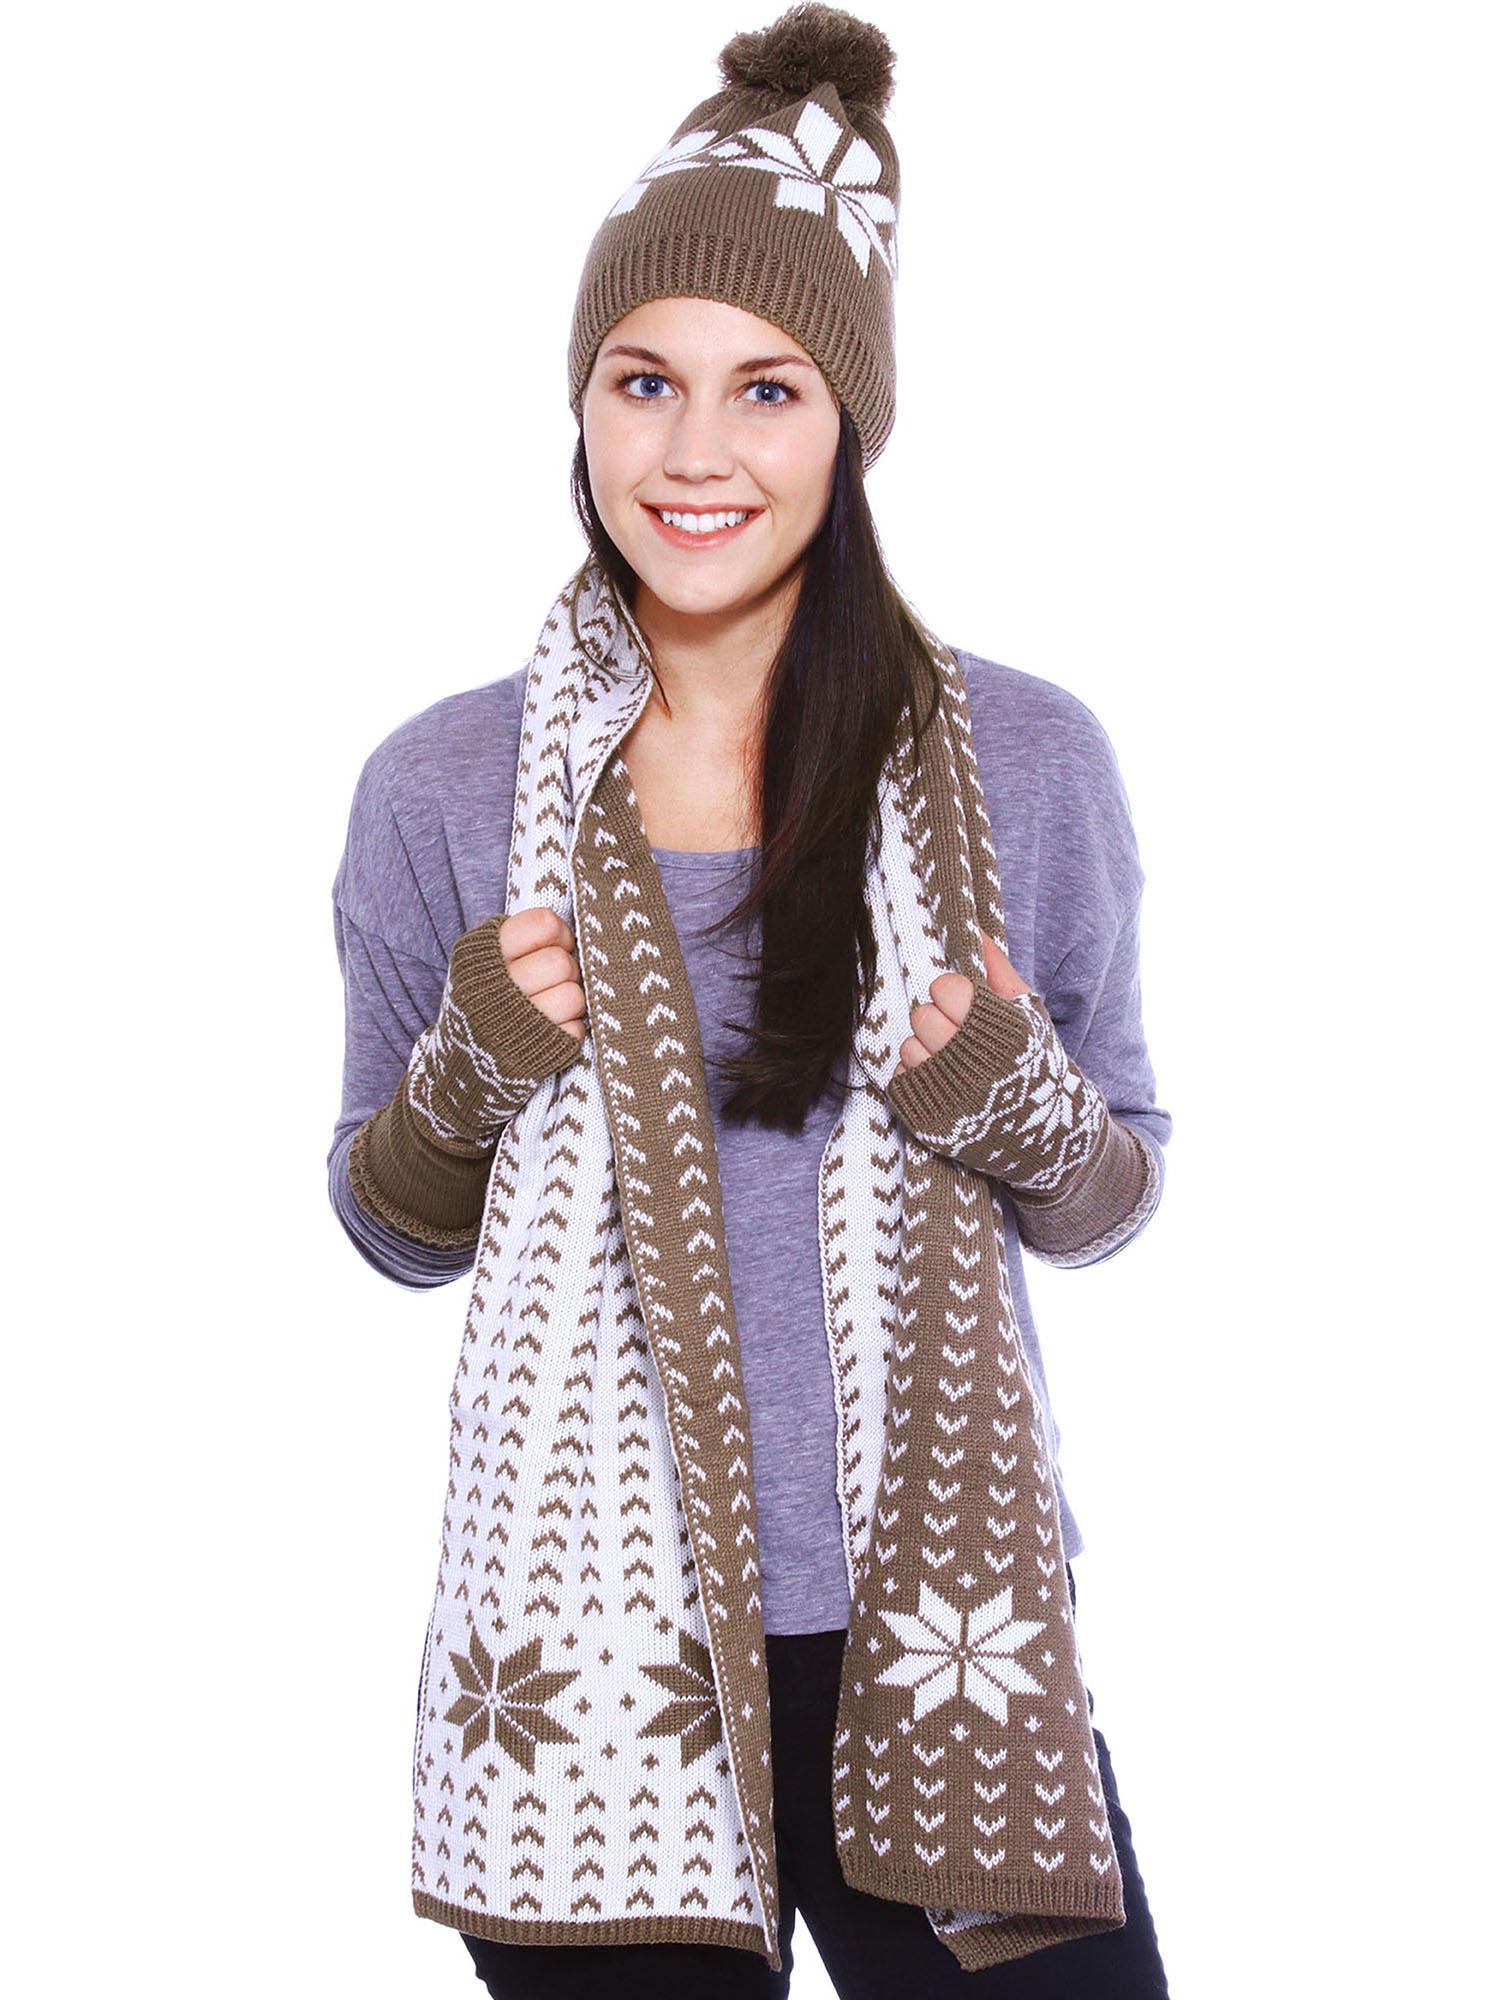 Grow-up Snowflake Knitted Hat Scarf Fingerless Gloves Set, Khaki